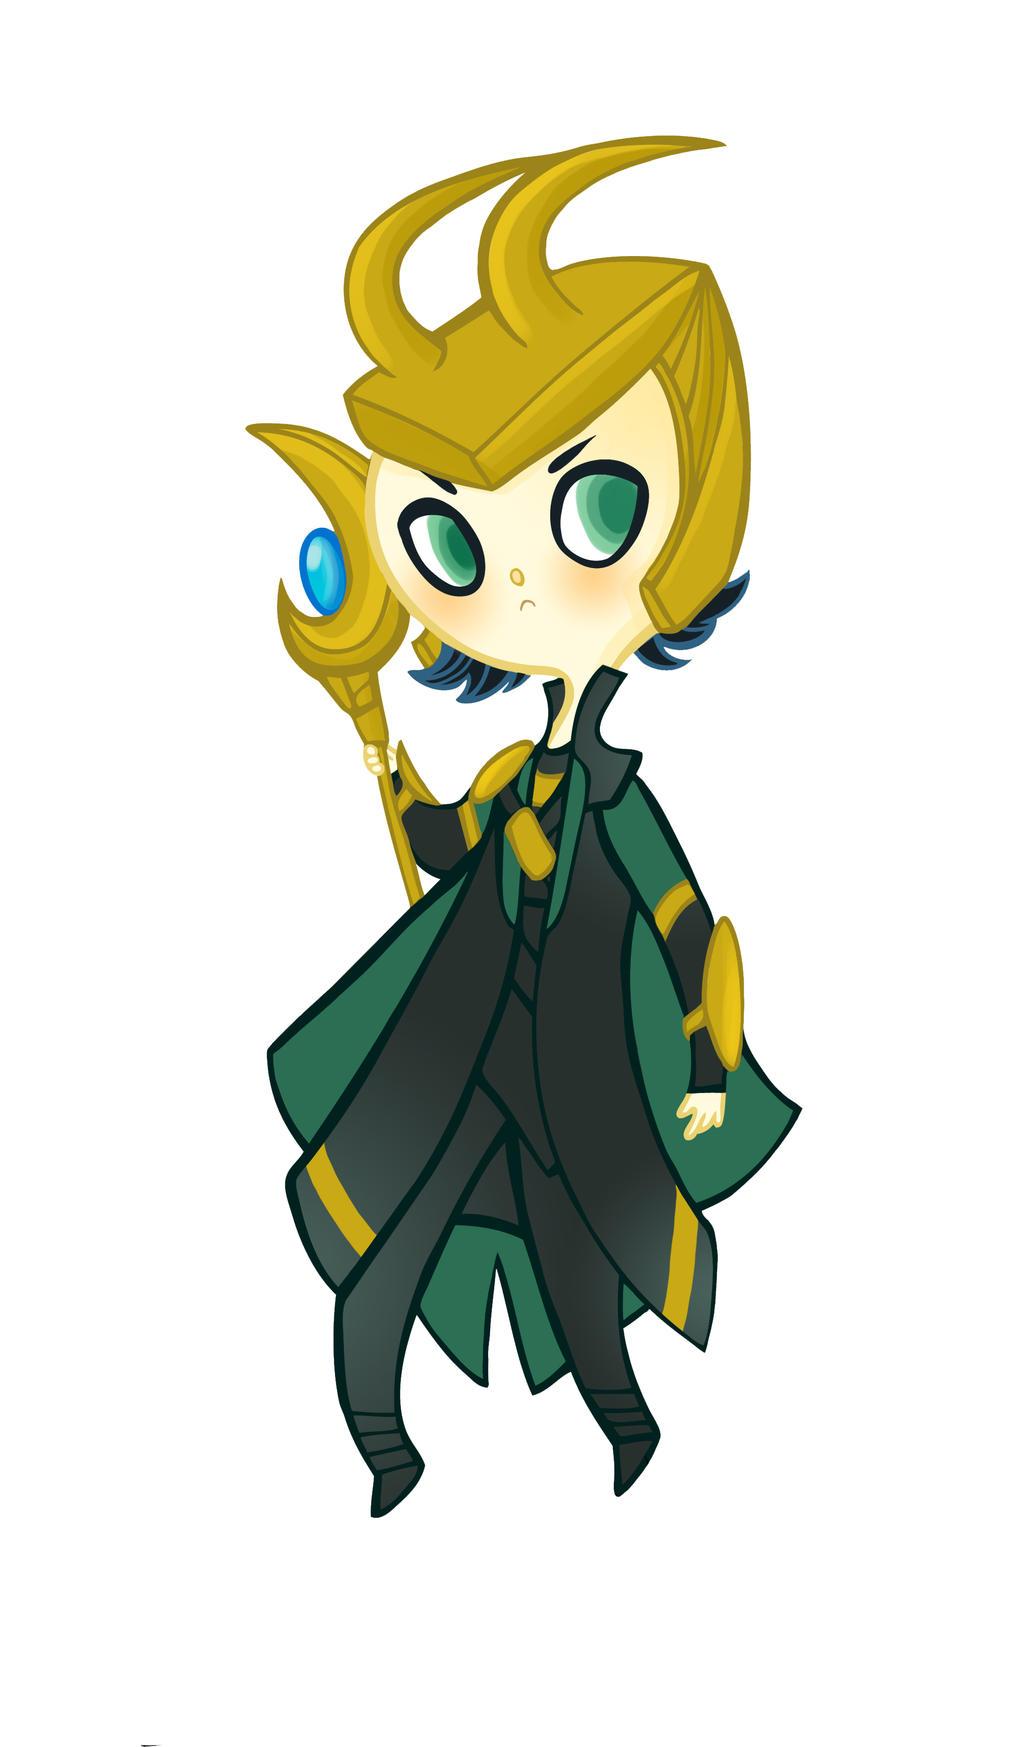 Cutie Loki by spicysteweddemon